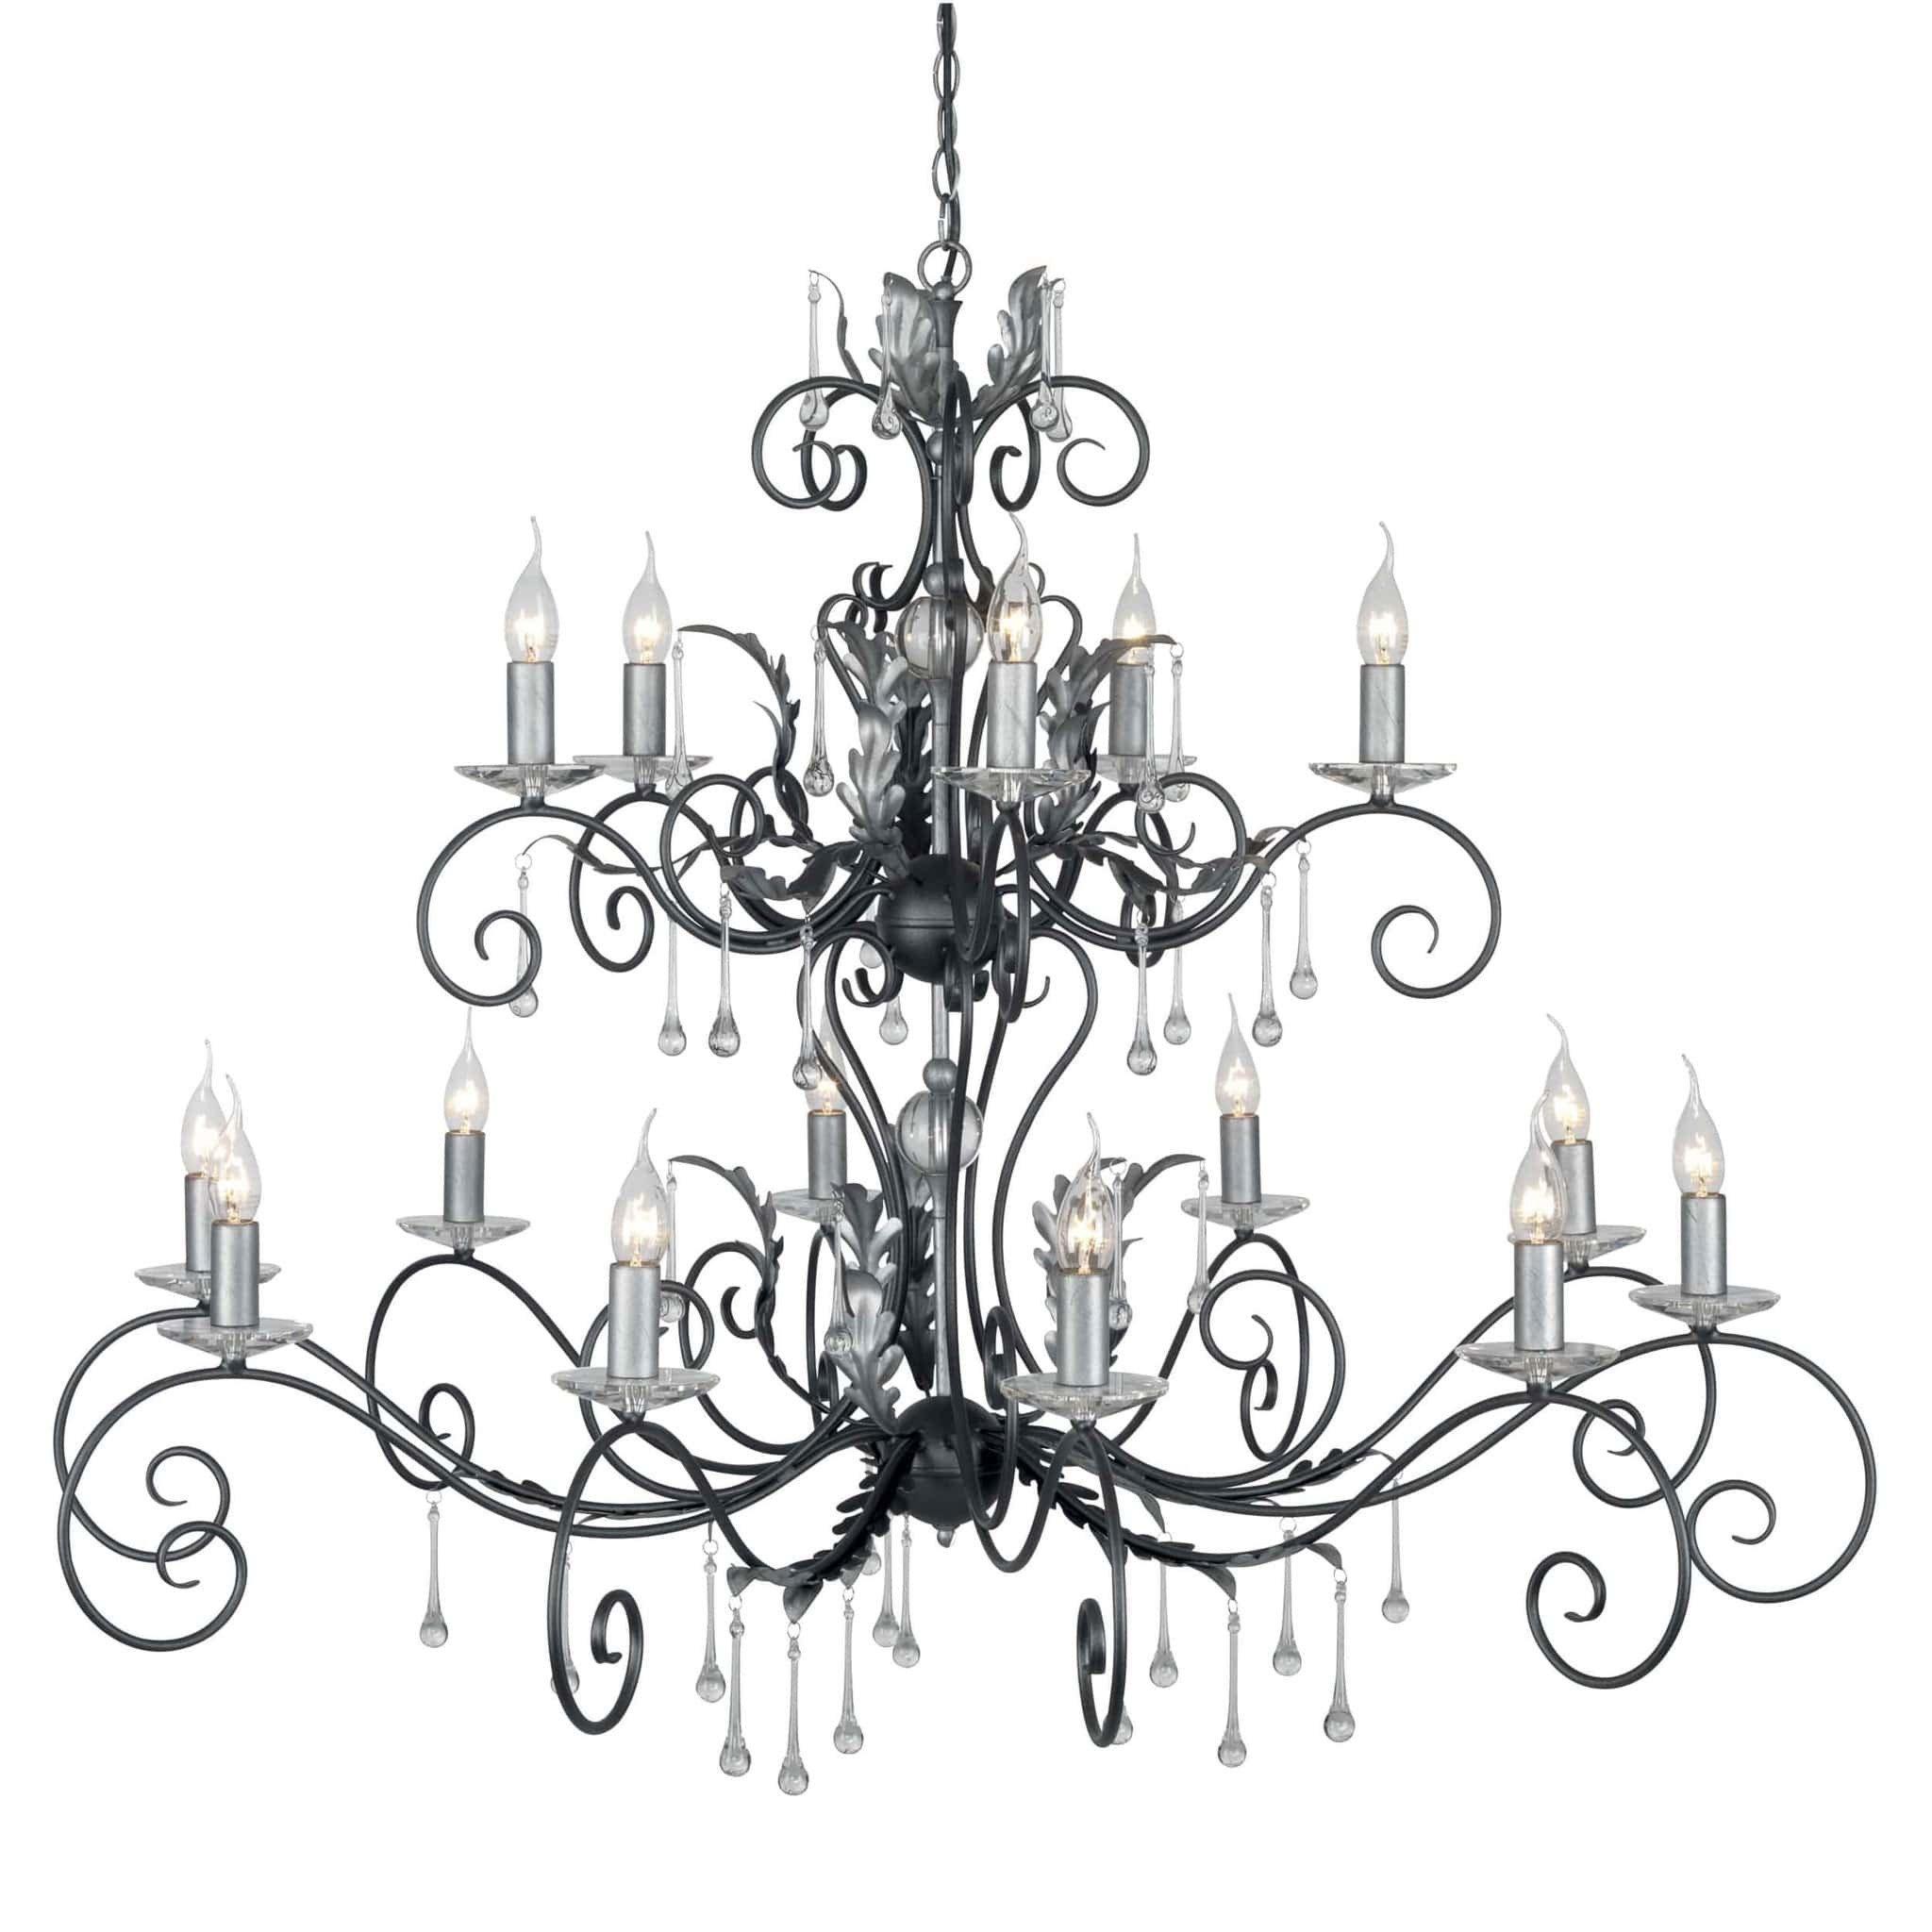 k light alida glass of wayfair crystal hampton house chandelier tadpoles